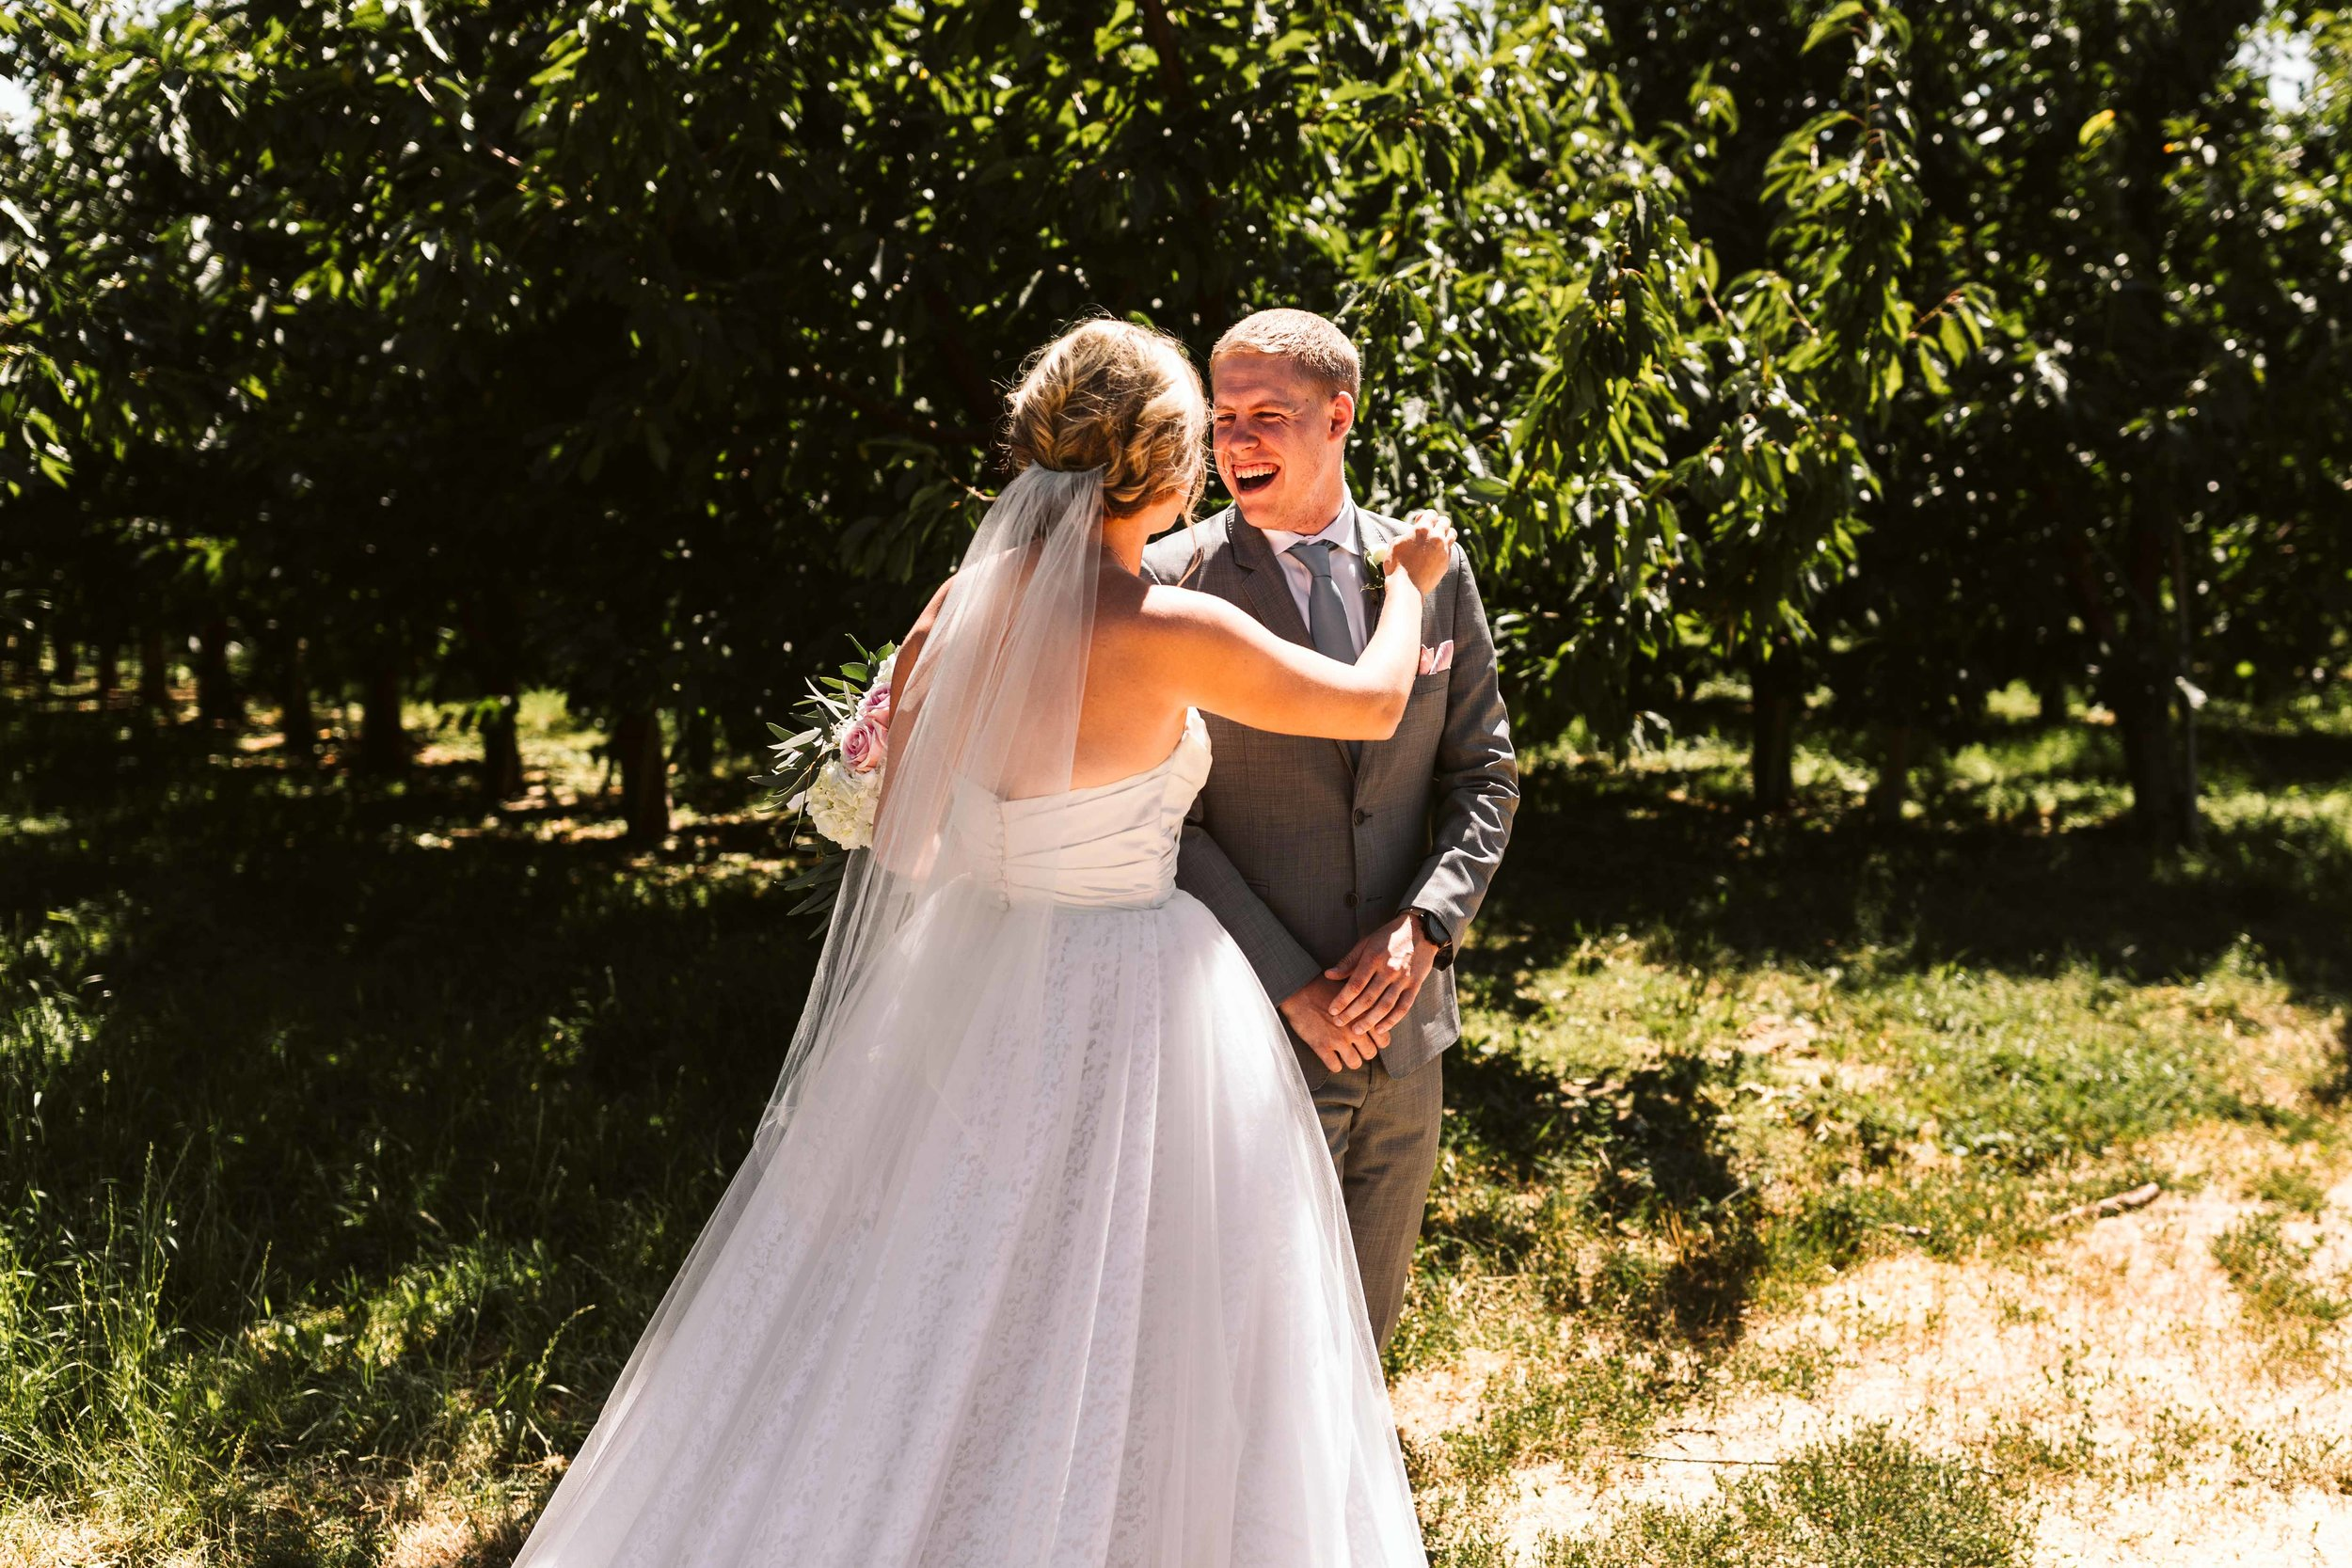 fontaine-estates-wedding-30.jpg